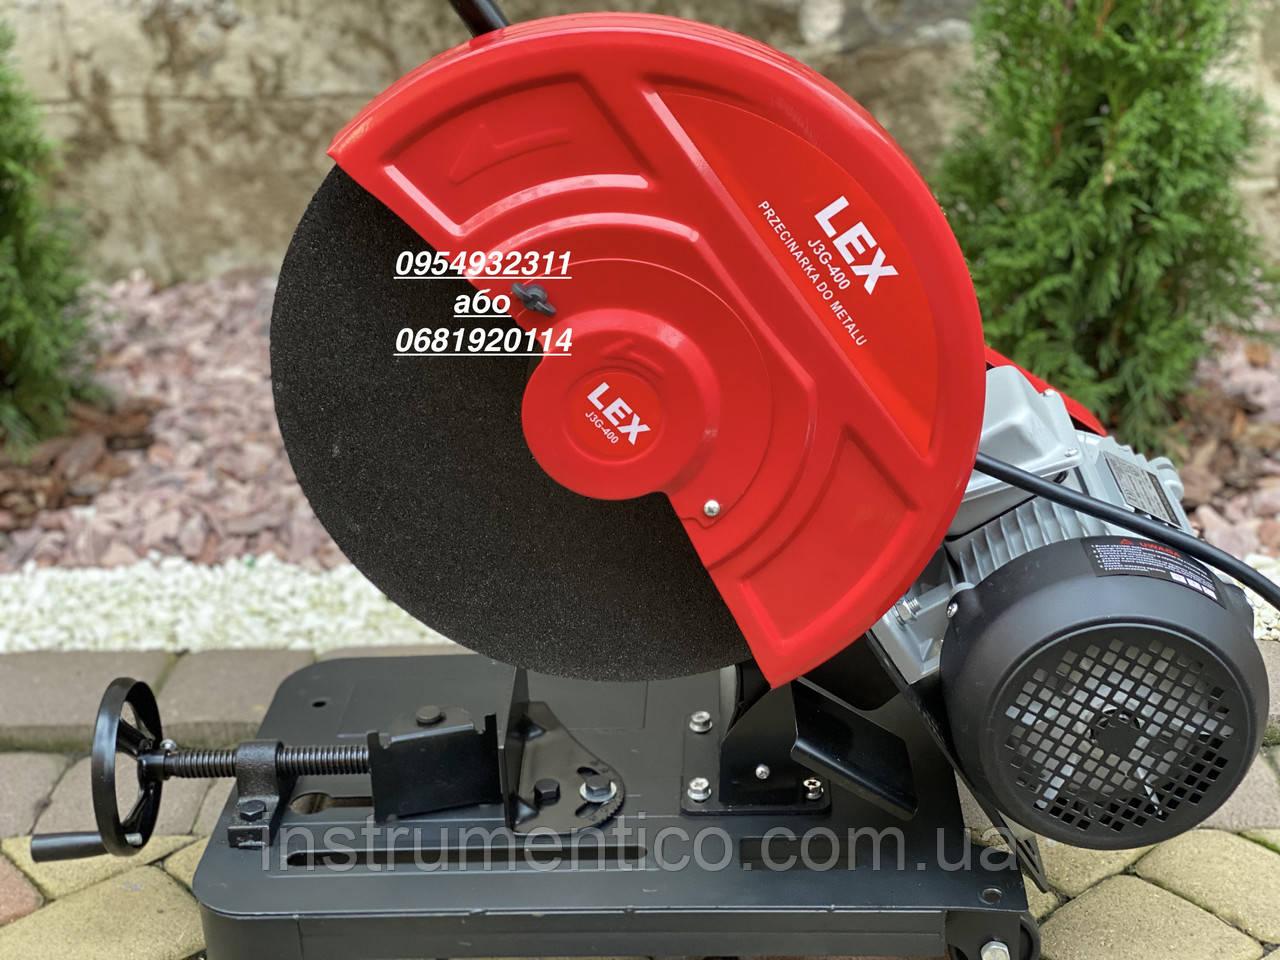 Металлорез электрический Lex J3G-400 4000 Вт